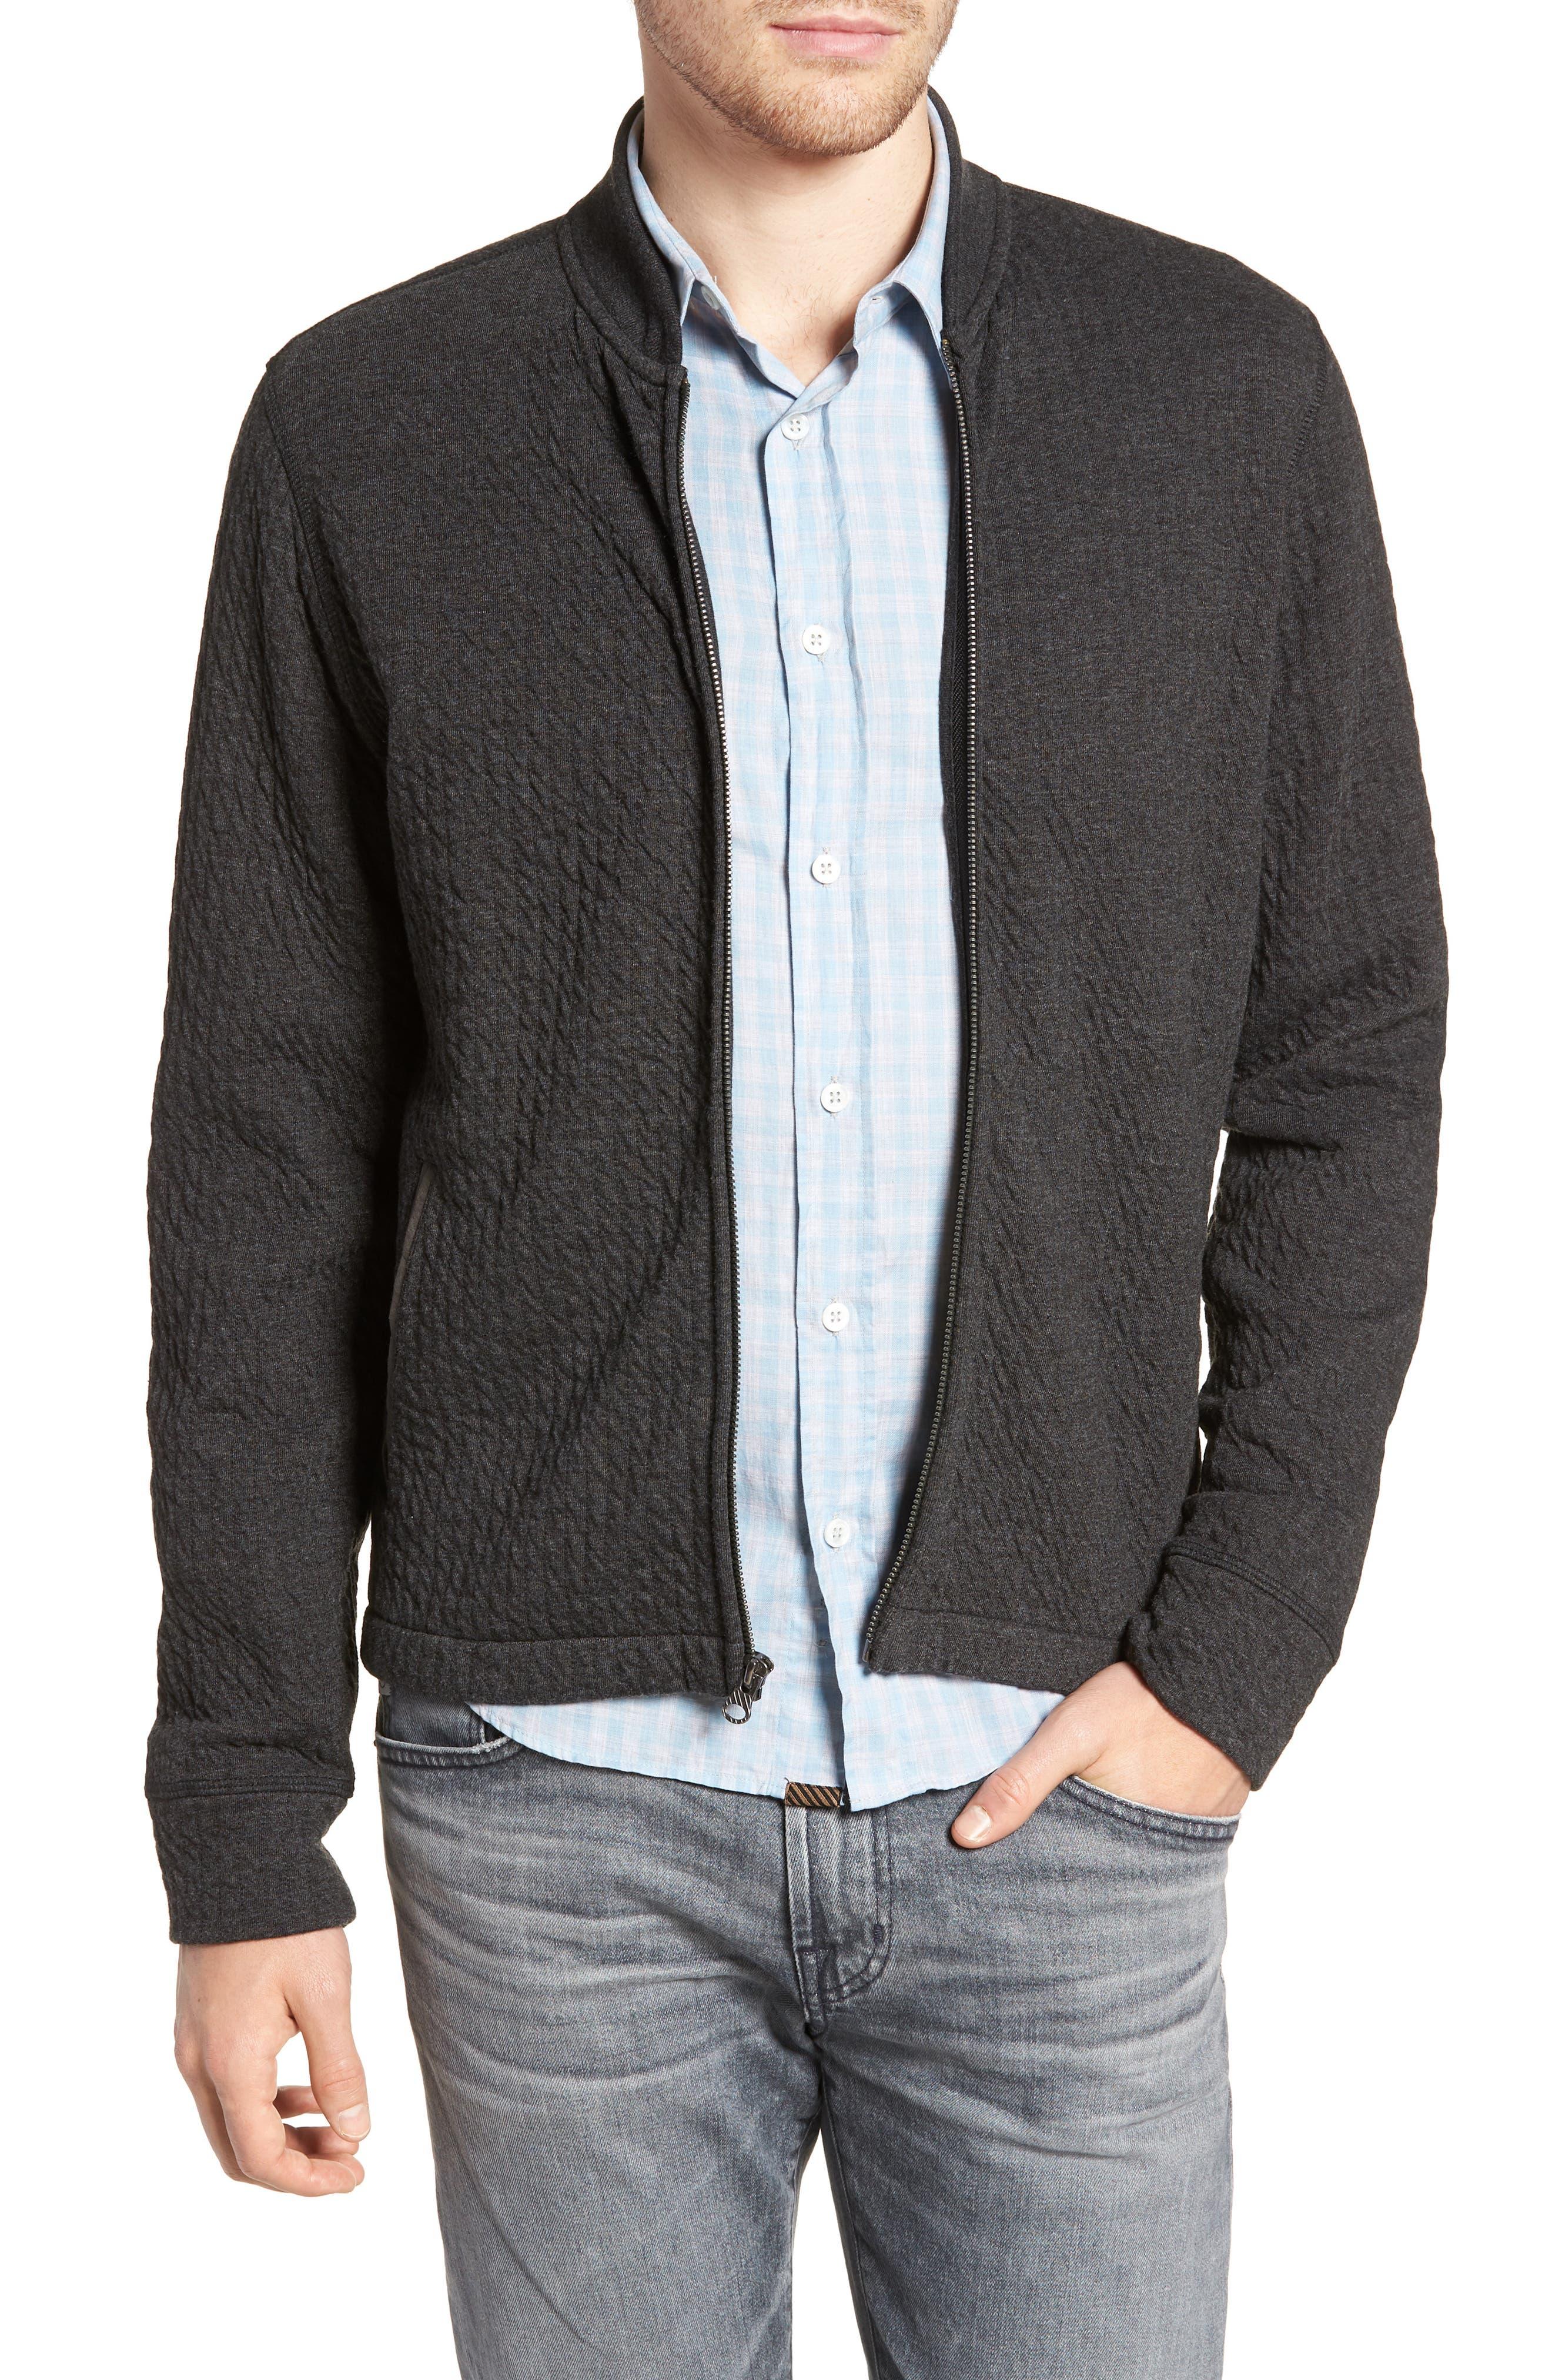 Giles Slim Fit Zip-Up Sweatshirt,                         Main,                         color, 402